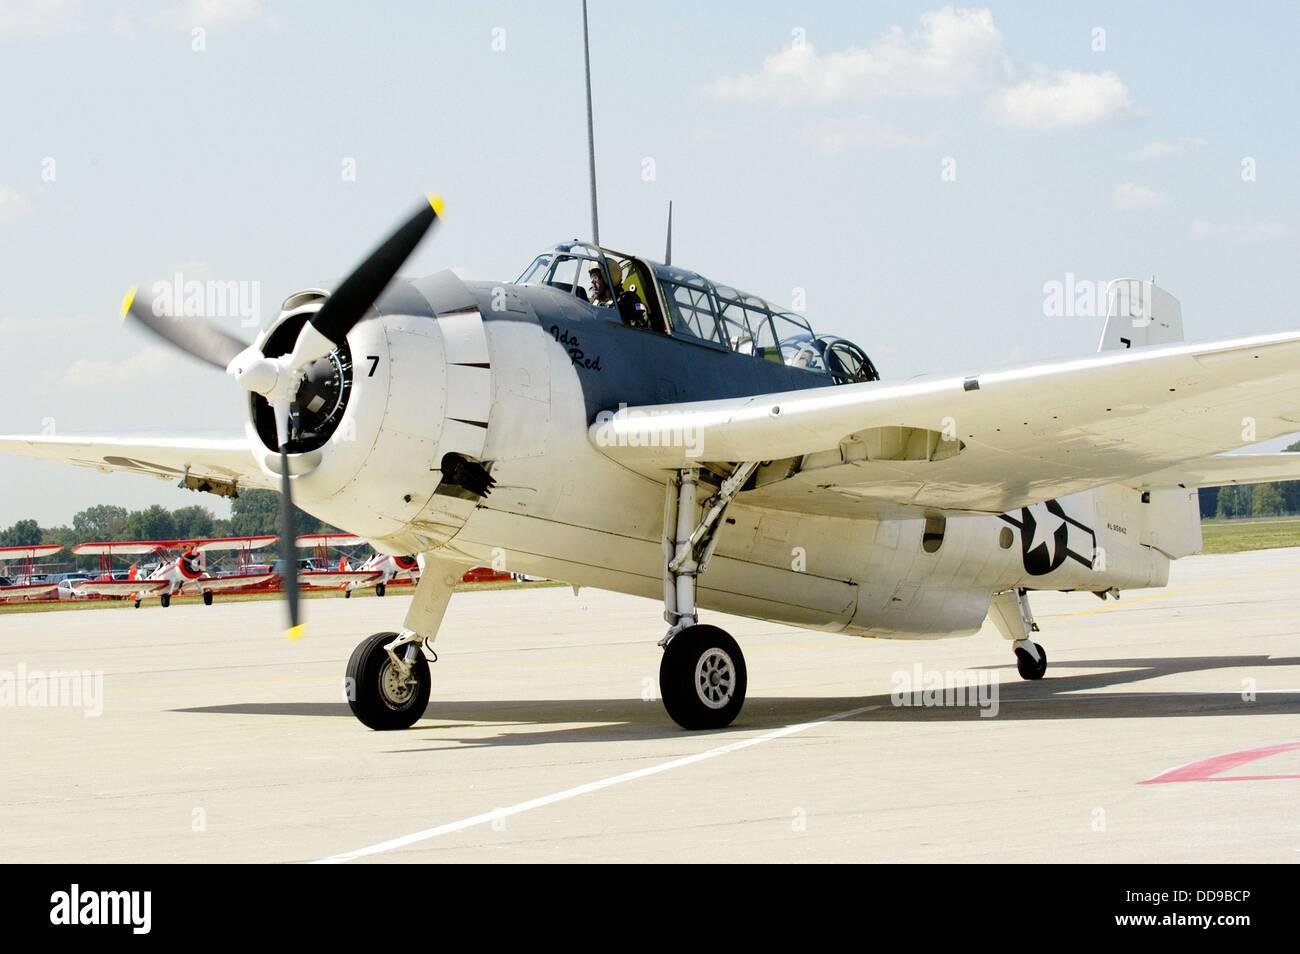 World War II Grumman Avenger aircraft on display. Selfridge Air Force Base, Mt. Clemens. Michigan. USA - Stock Image